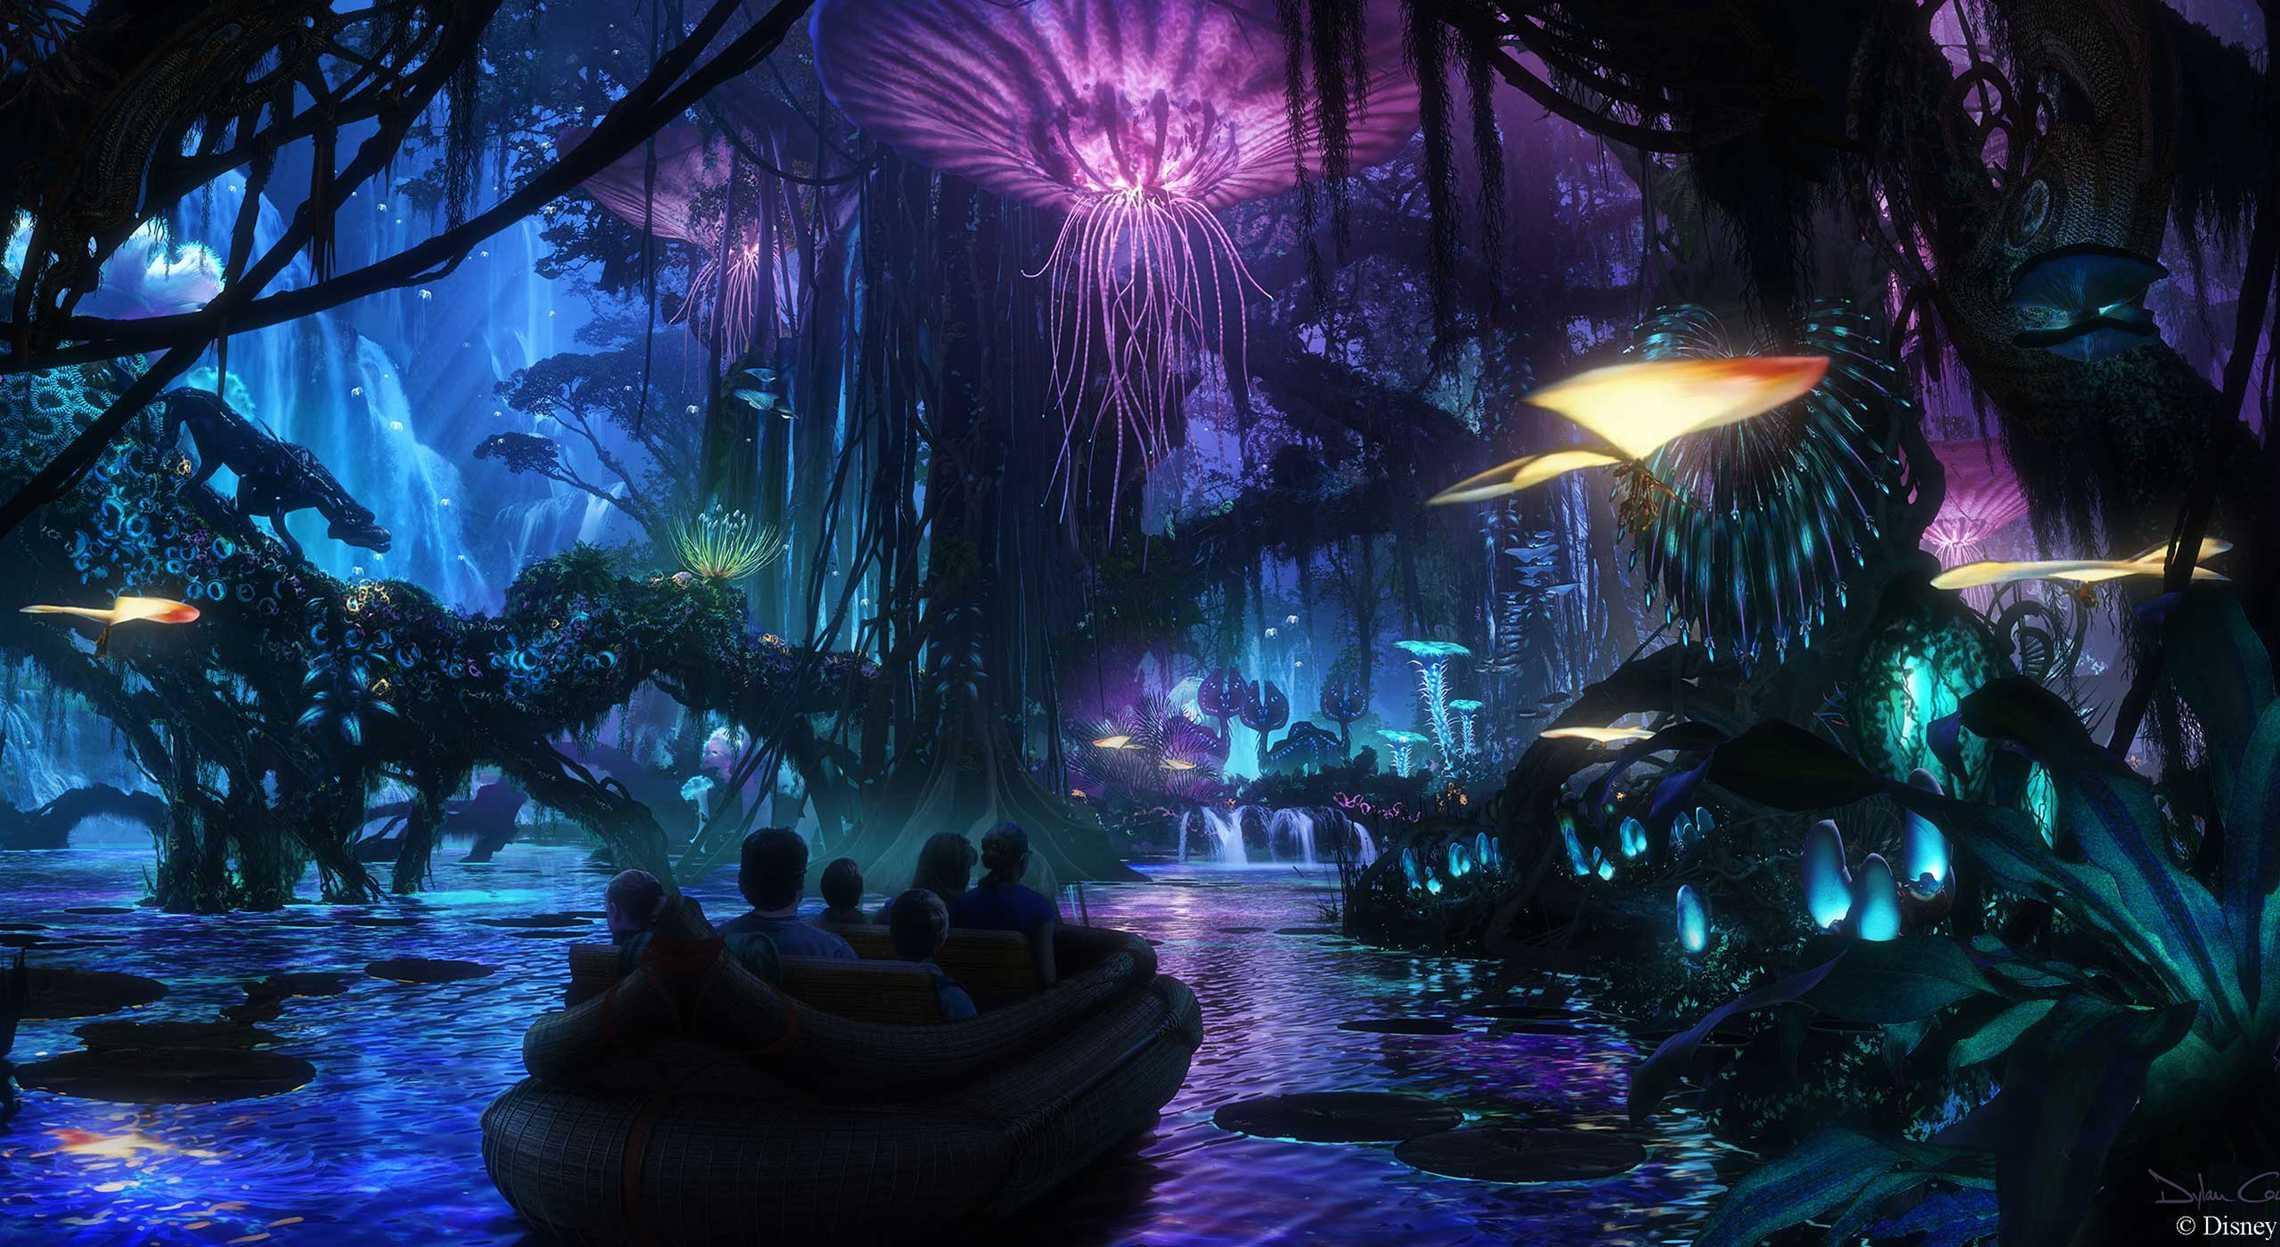 Na'Vi River Journey AVATAR World of Pandora Animal Kingdom